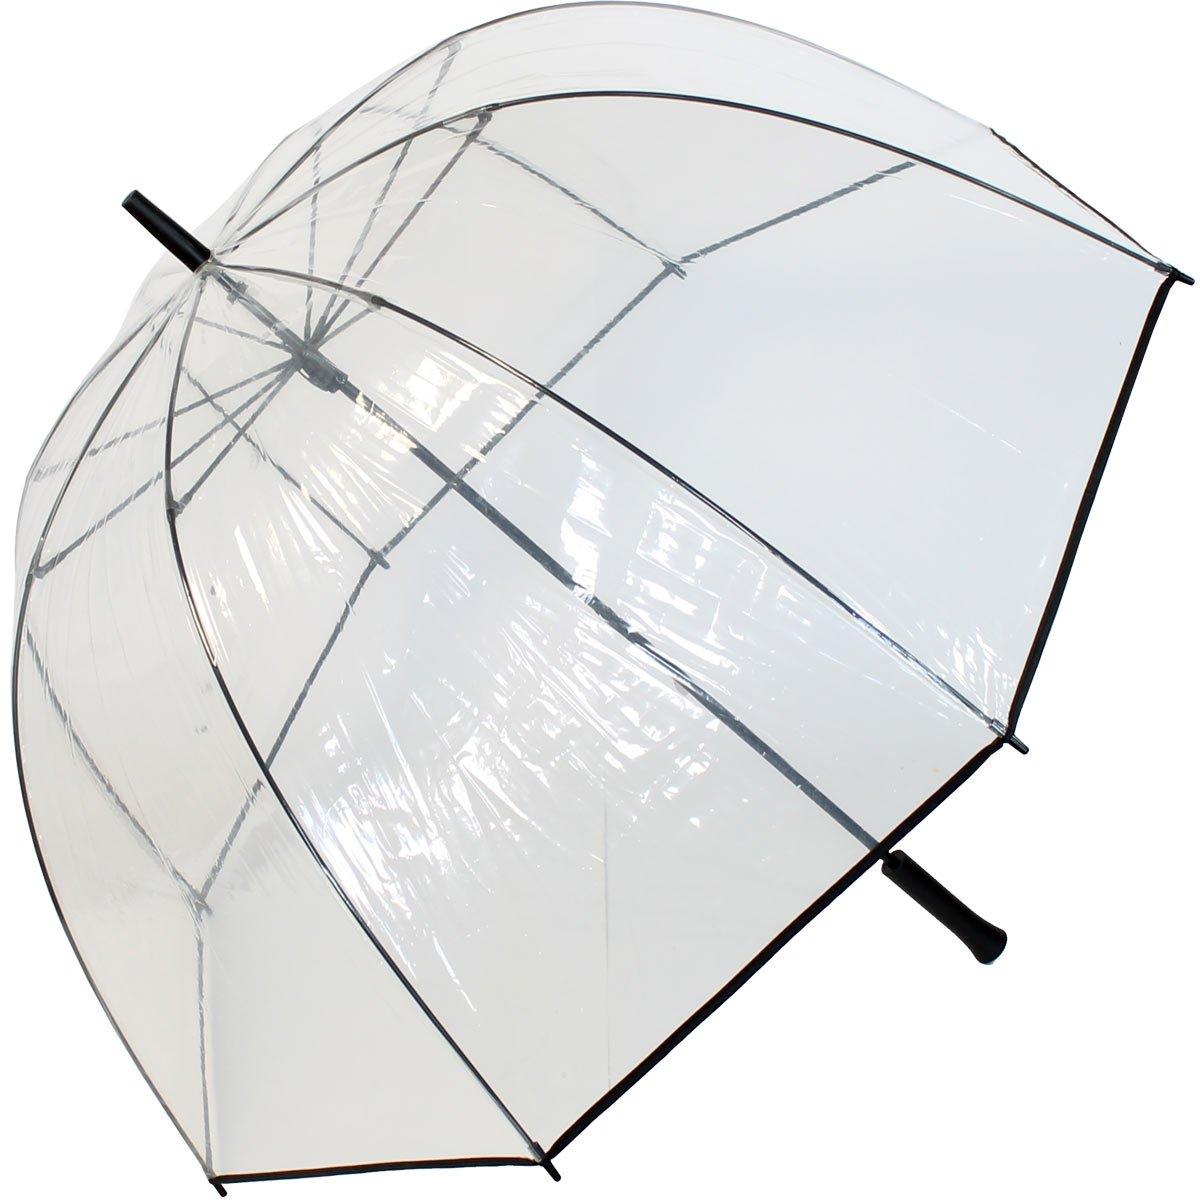 Paraguas con pantalla extra grande adecuado para dos personas.